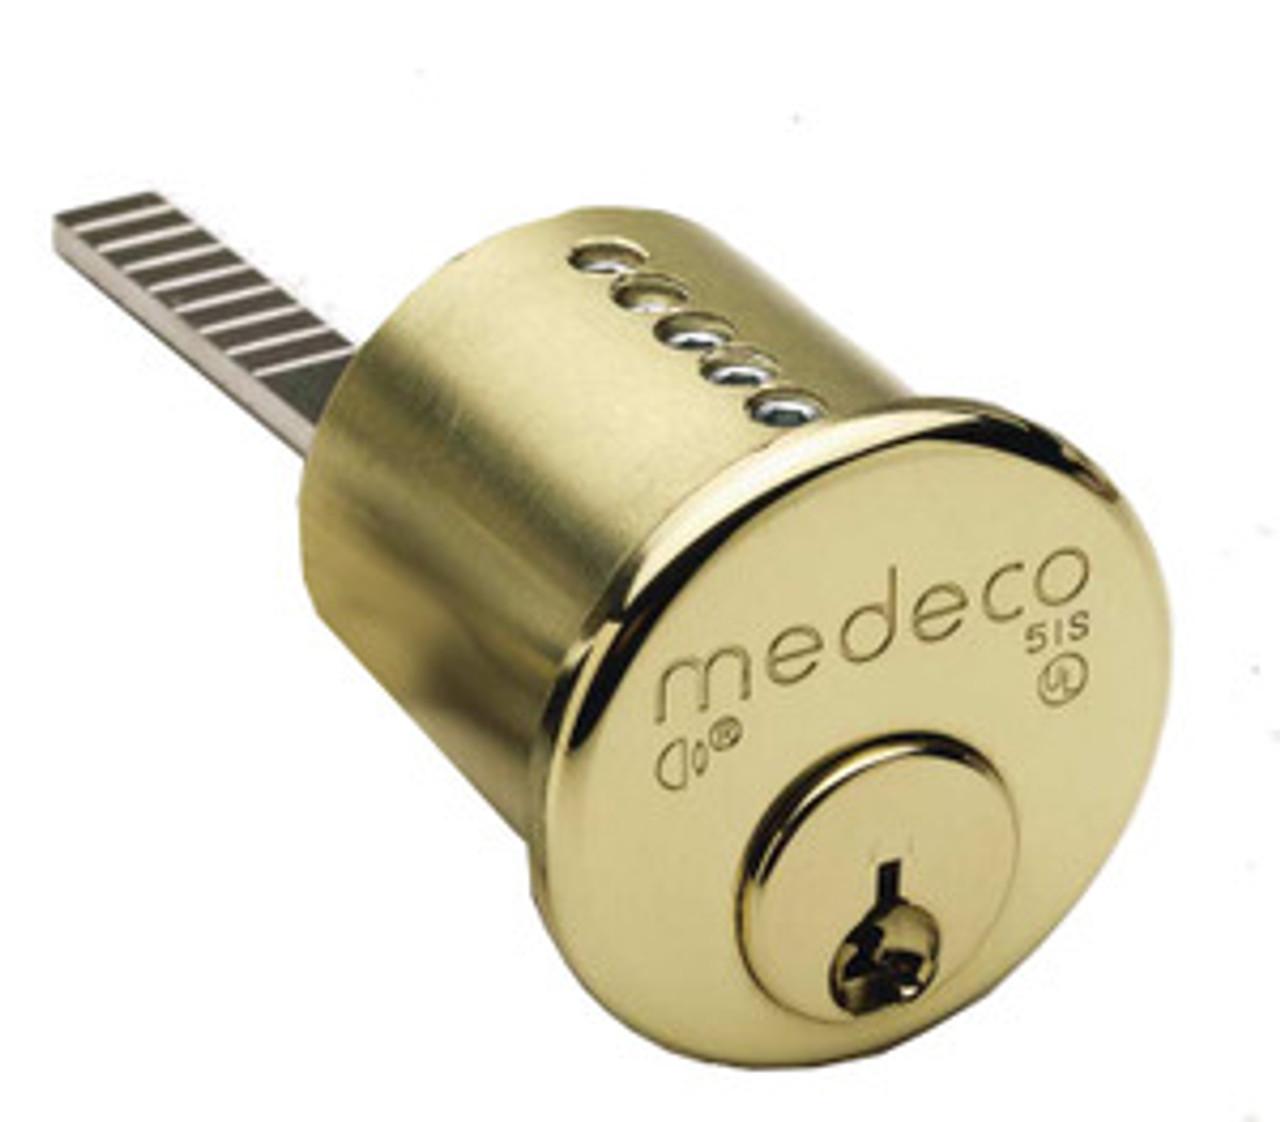 Medeco 10 0400 6 Pin Rim Cylinder E D Locks Amp Security Llc